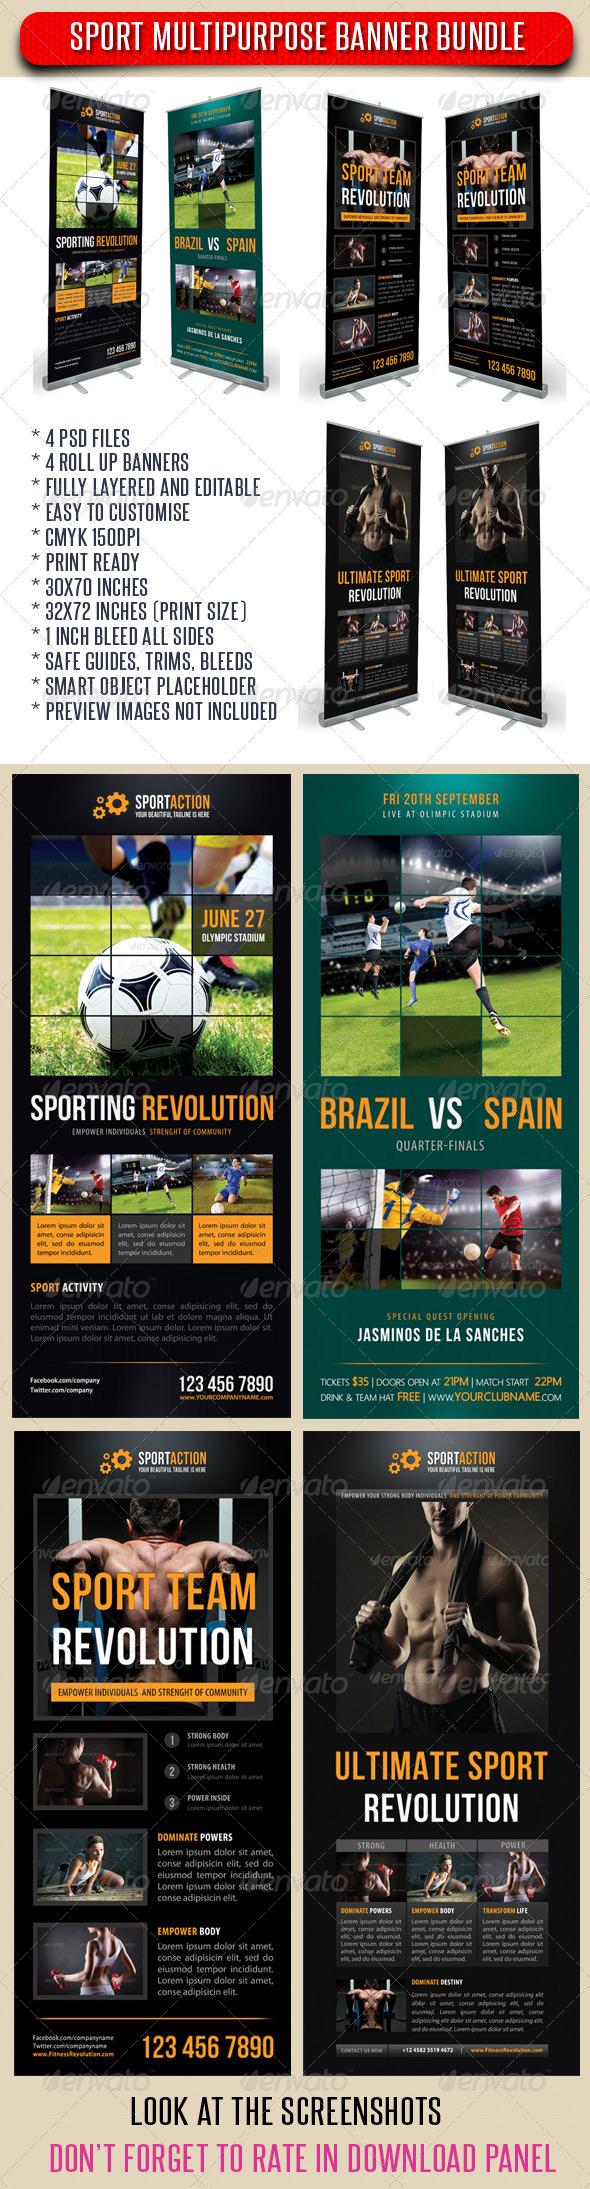 GraphicRiver 4 in 1 Sport Rollup Banner Bunle 02 7351406